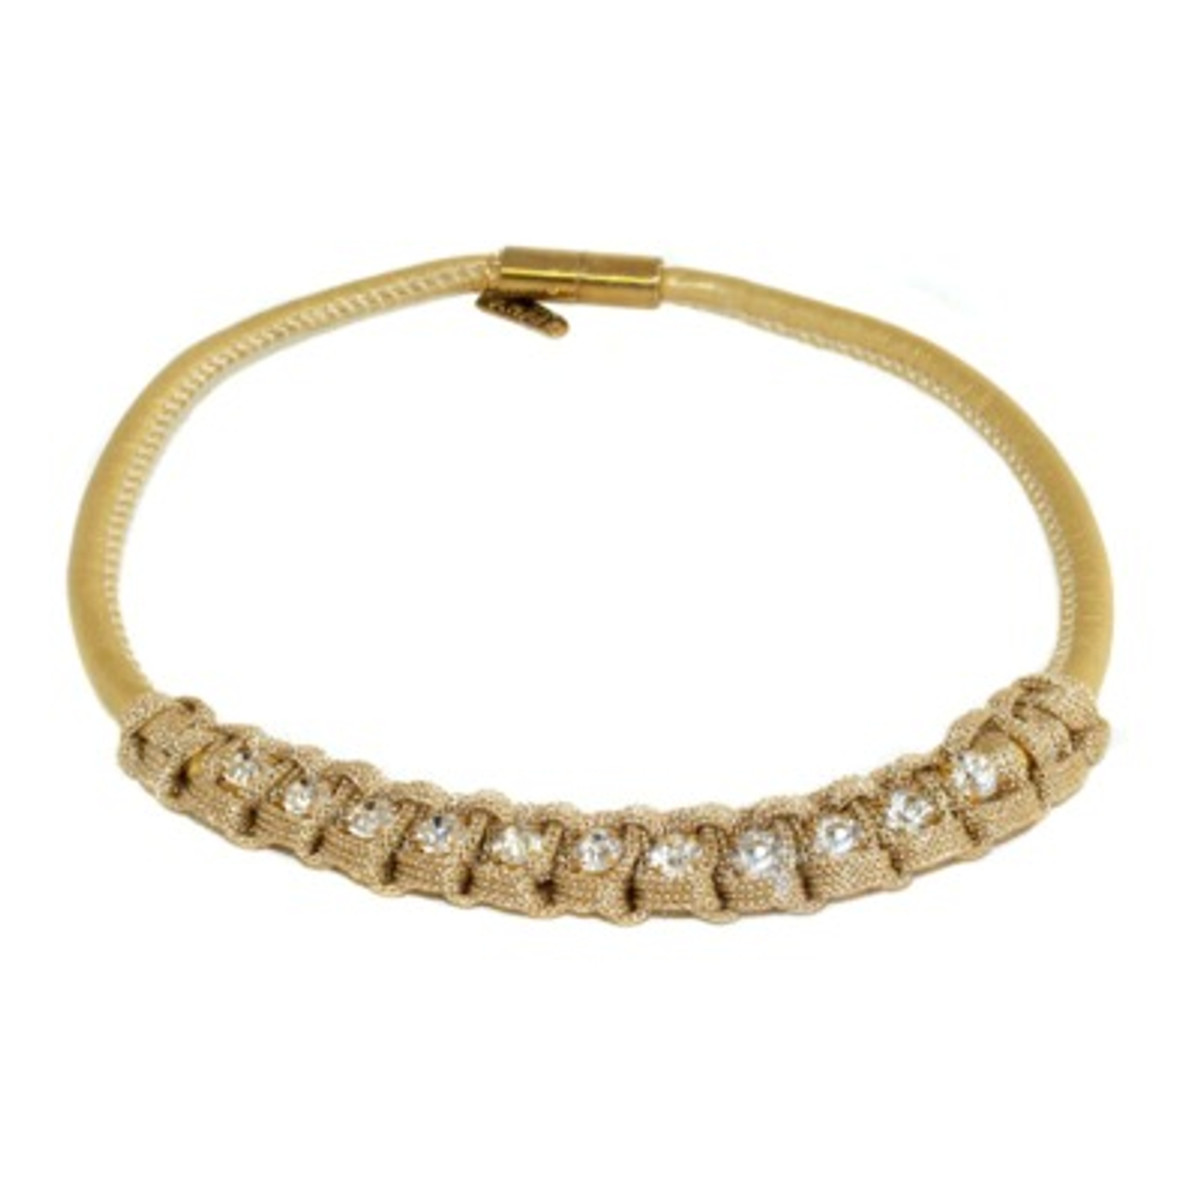 Anat Jewelry Necklace - Urban Chic